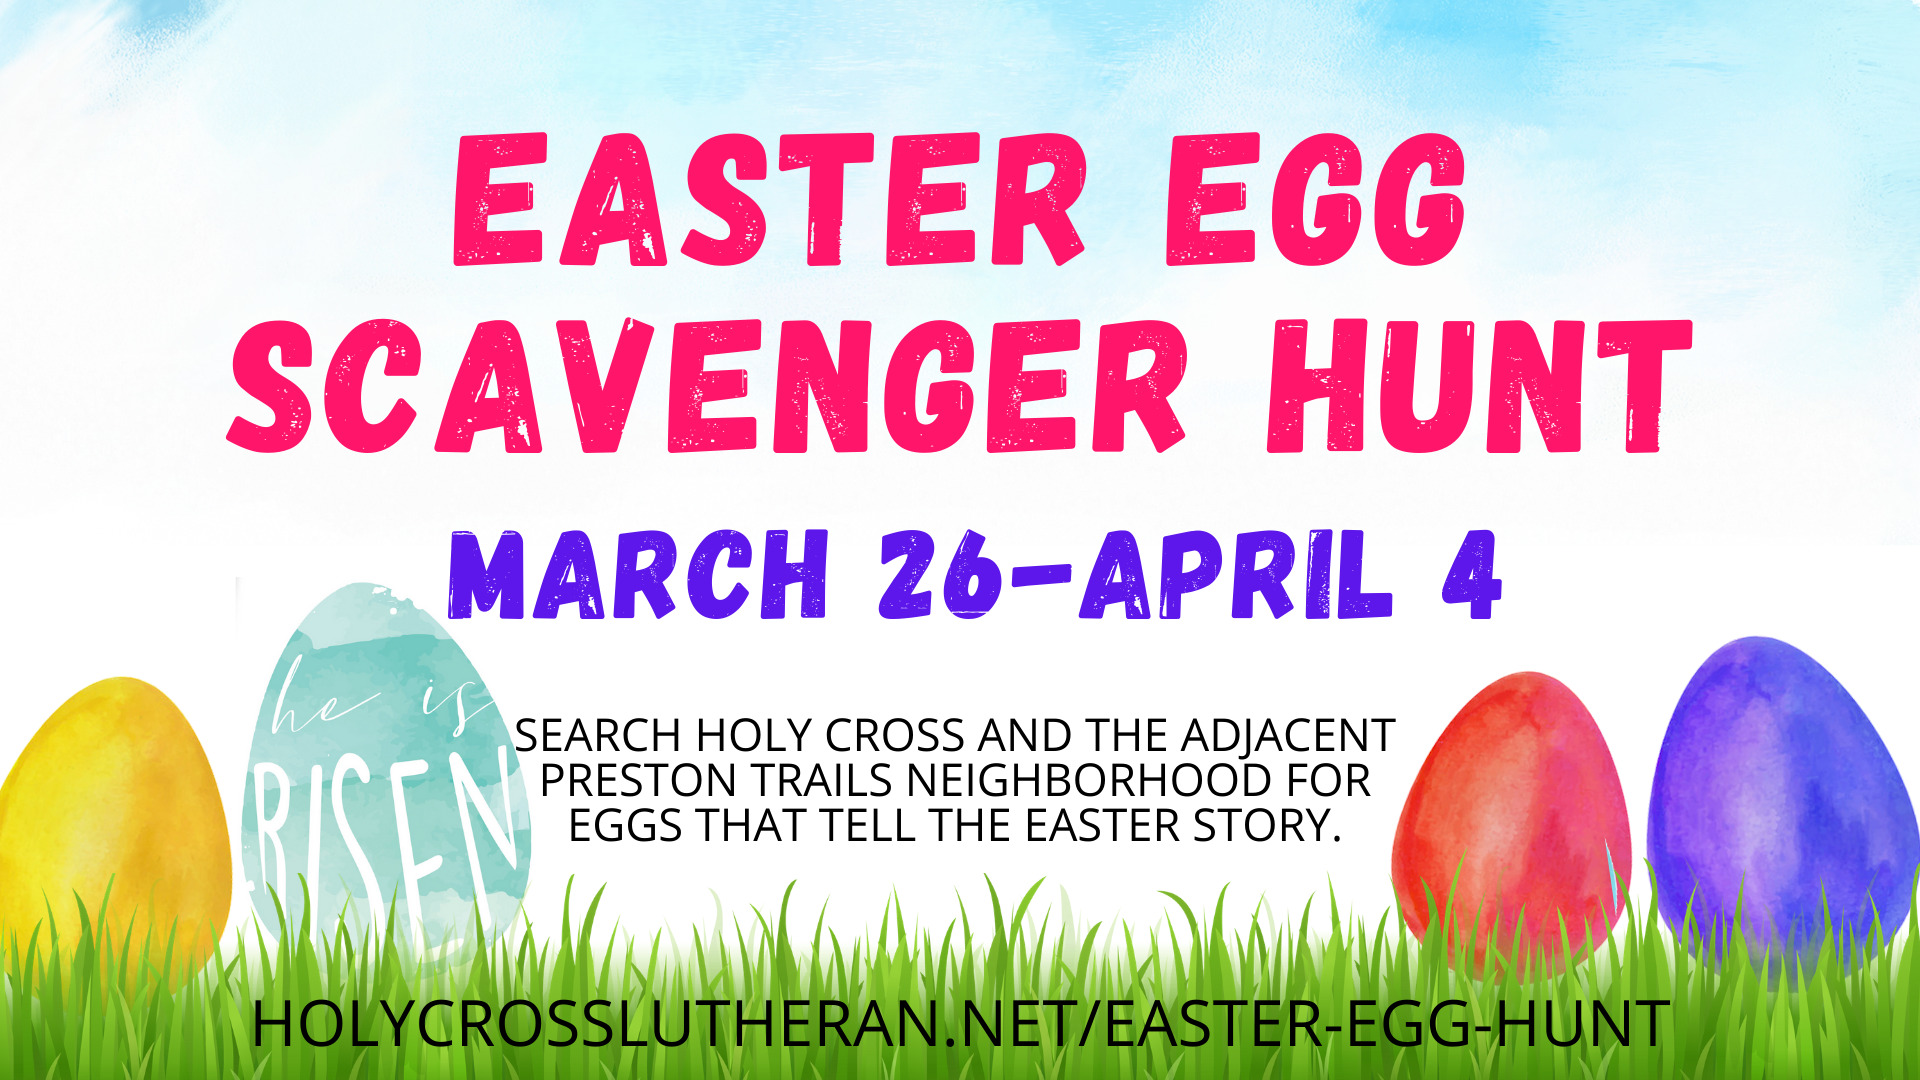 Neighborhood Scavenger Hunt, March 26-April 4